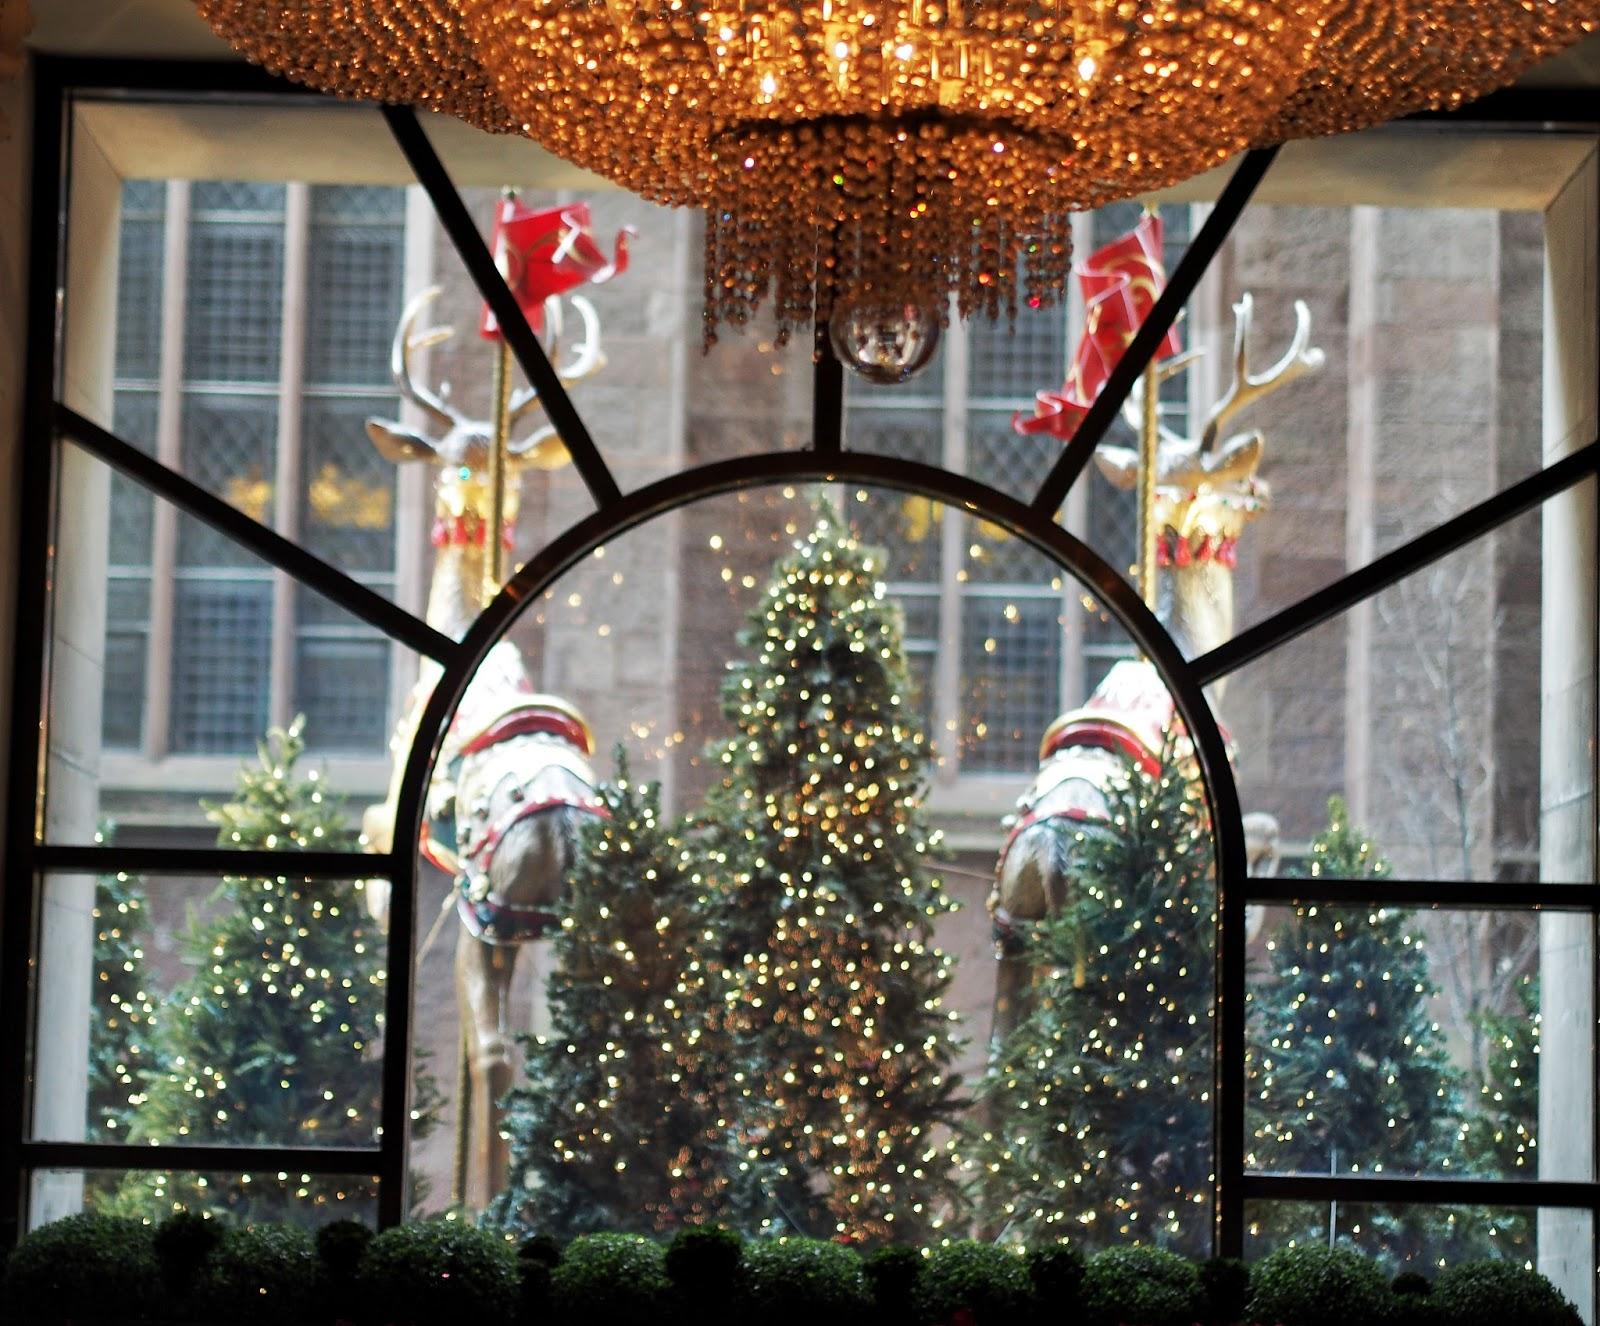 Reindeer #twotinyreindeer #bgwindows #windowwatchers #holidaywindows #5thavenuewindows #NYC  #holidays #besttimeoftheyear #nyc ©2014 Nancy Lundebjerg